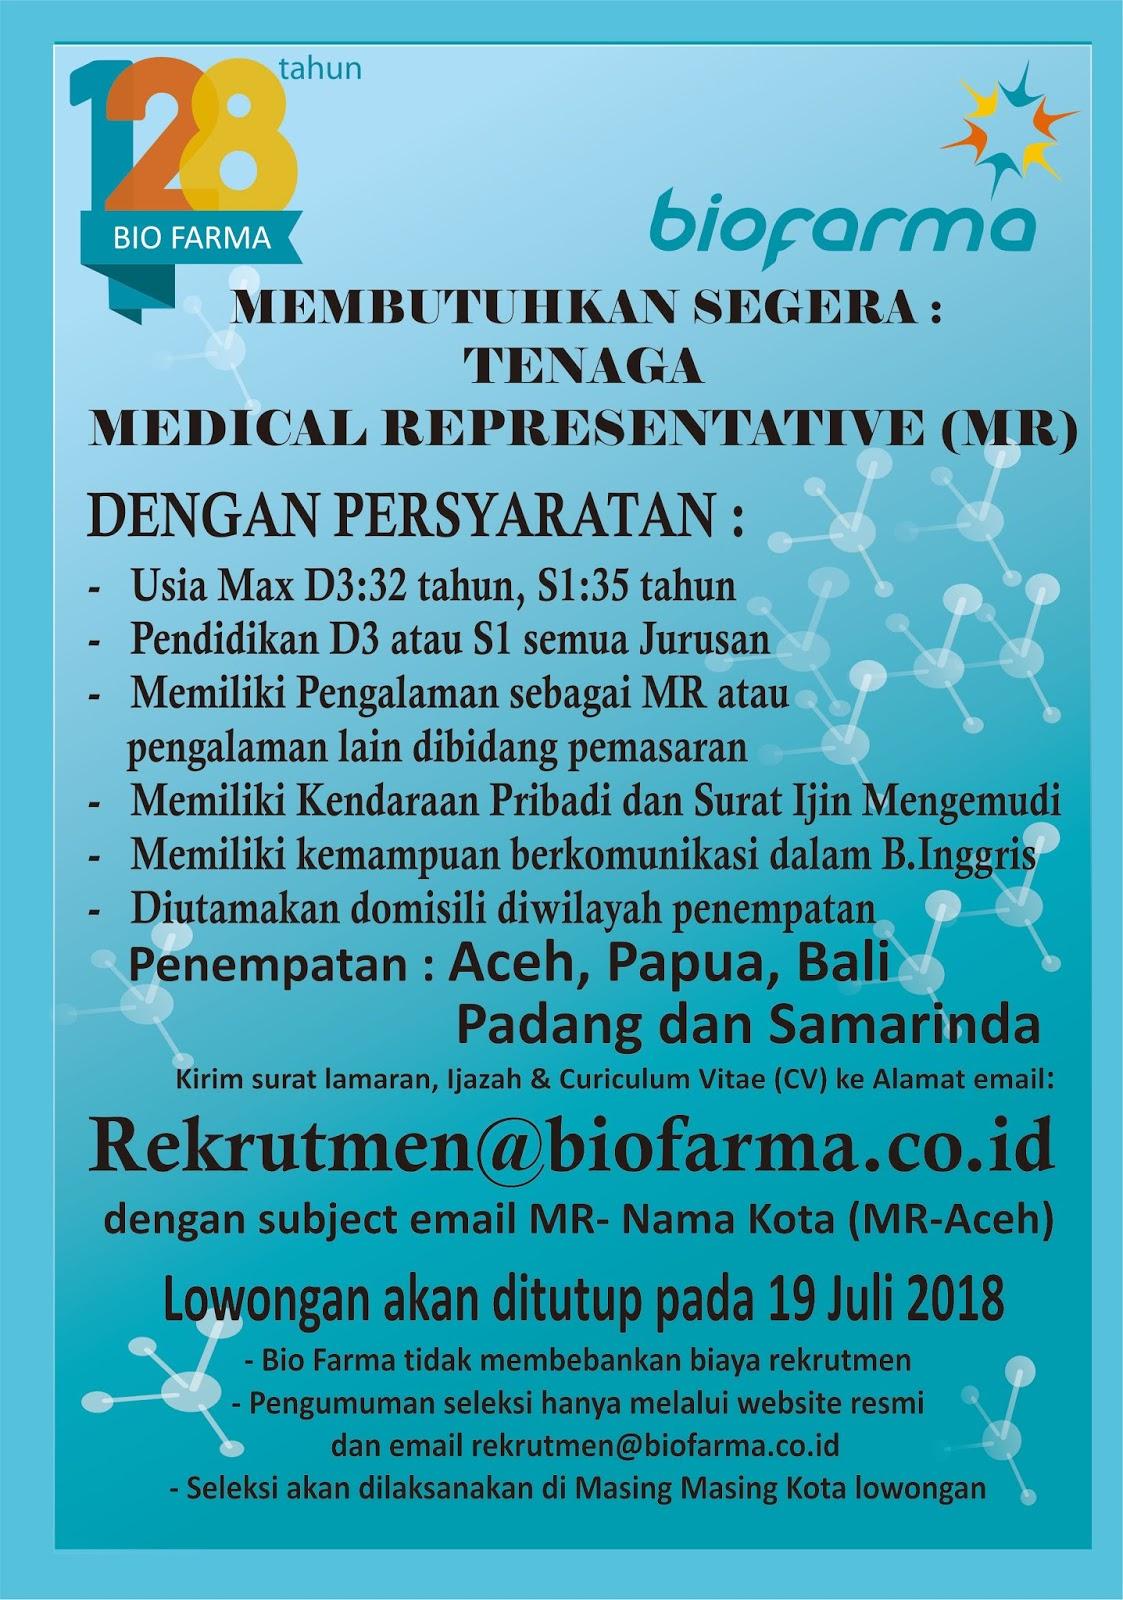 Rekrutmen Lowongan BUMN PT Bio Farma (Persero)